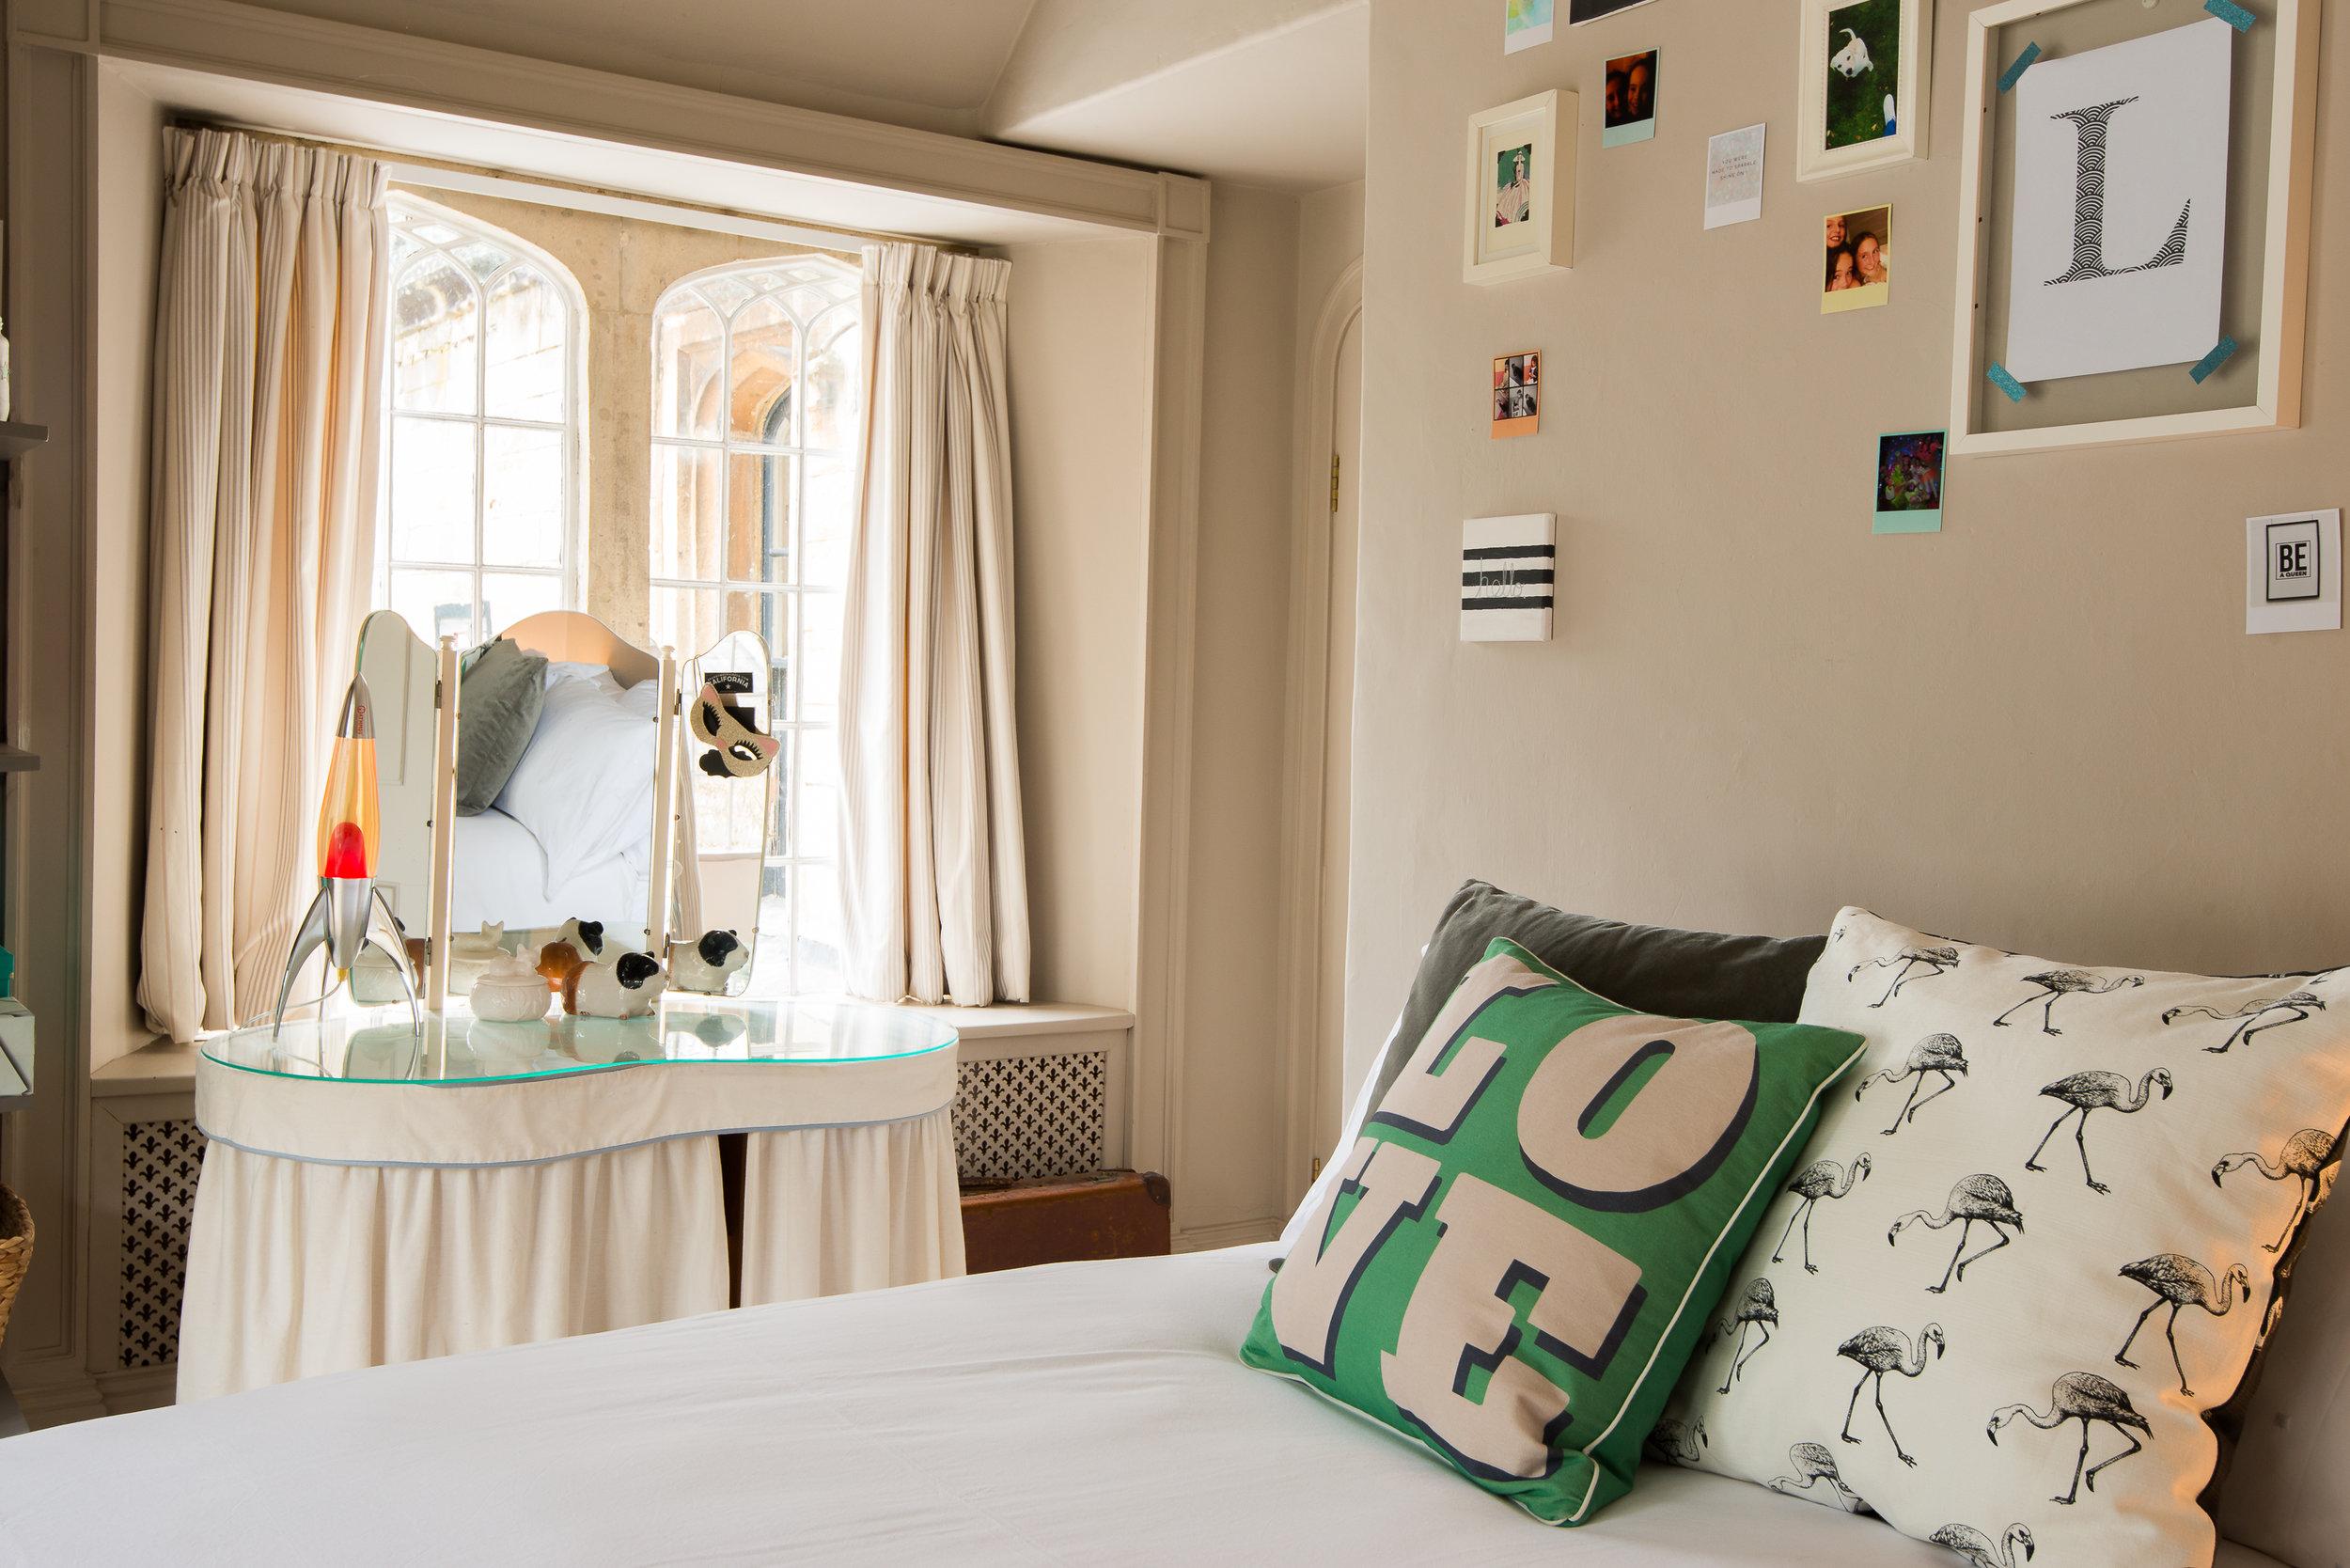 Bed 2 cushions.jpg